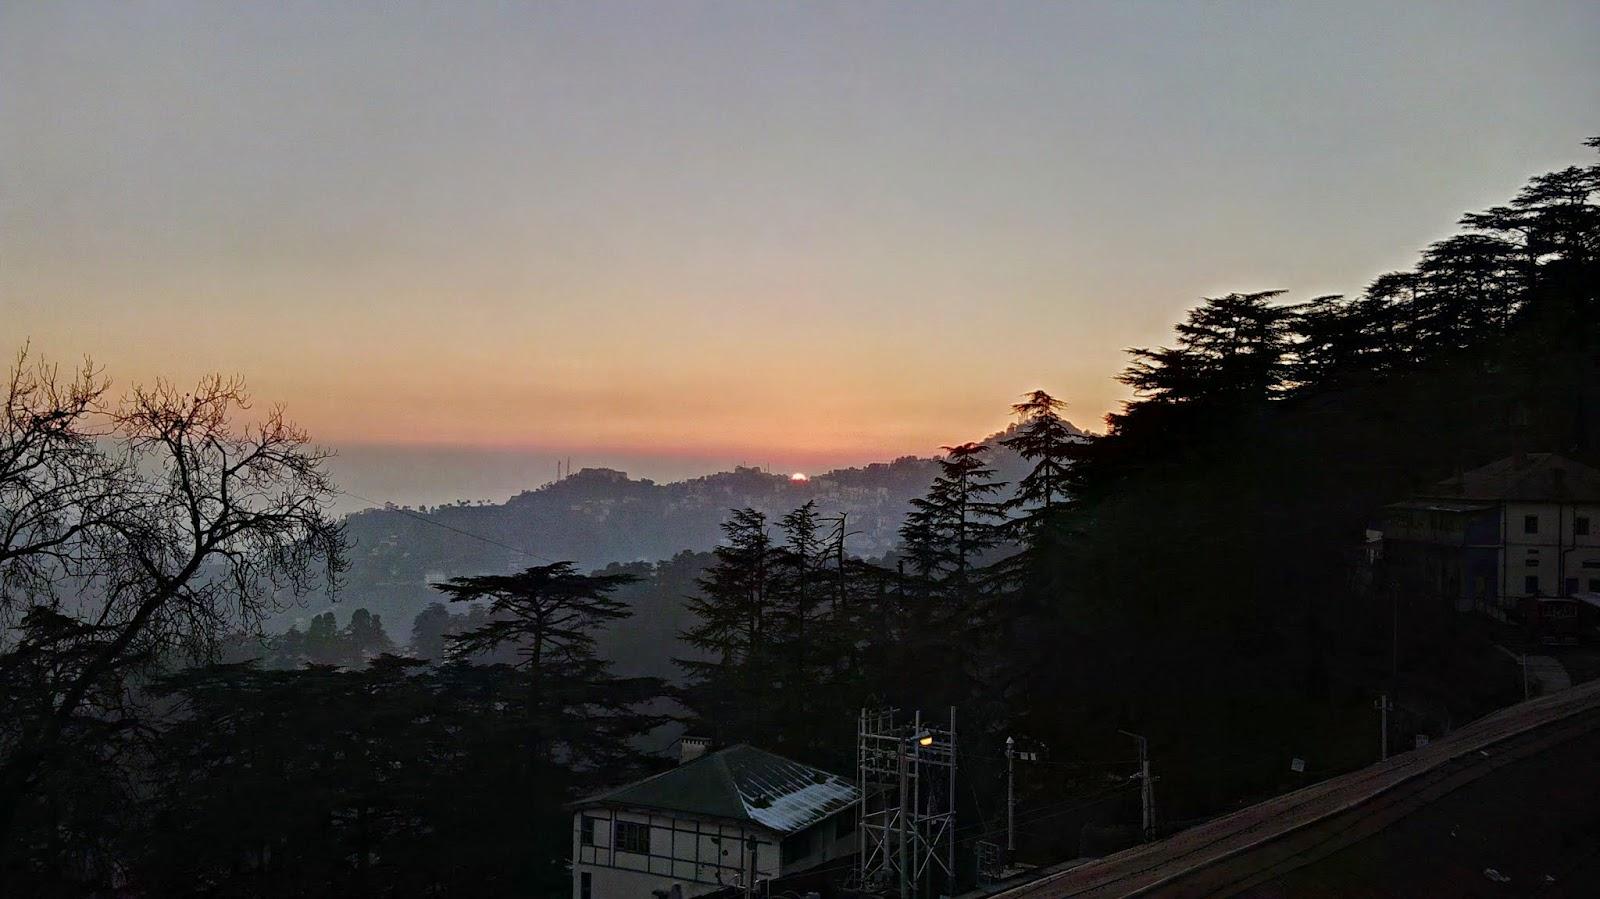 trip to shimla Road trip to the mountains (delhi-shimla-kufri-chail) close to himachal pradesh & uttarakhand offering a lot of scenic mountain terrains.